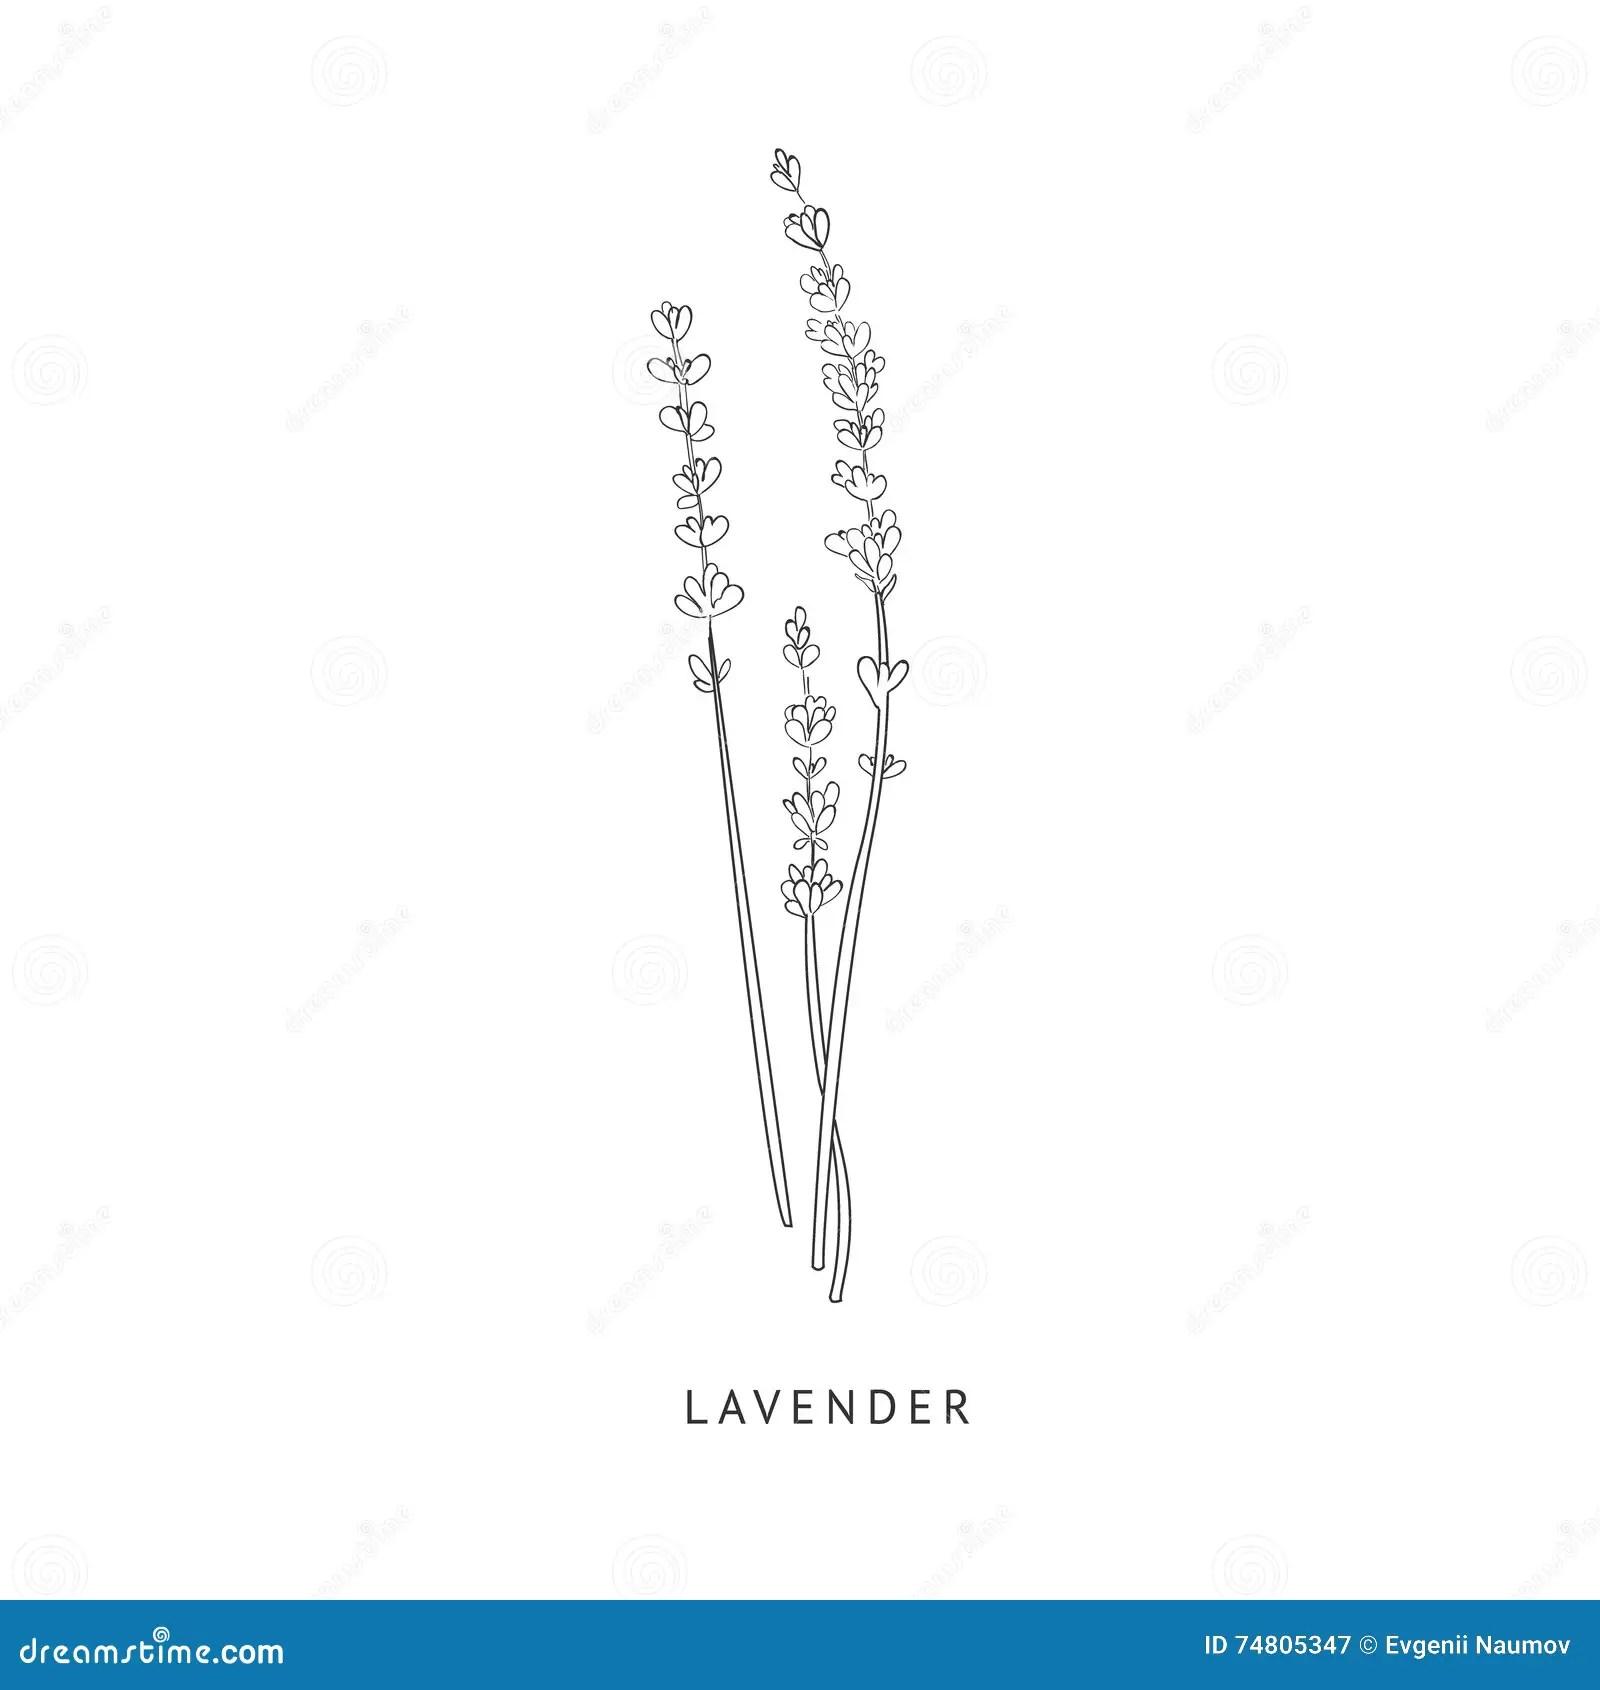 Lavender Hand Drawn Realistic Sketch Stock Vector